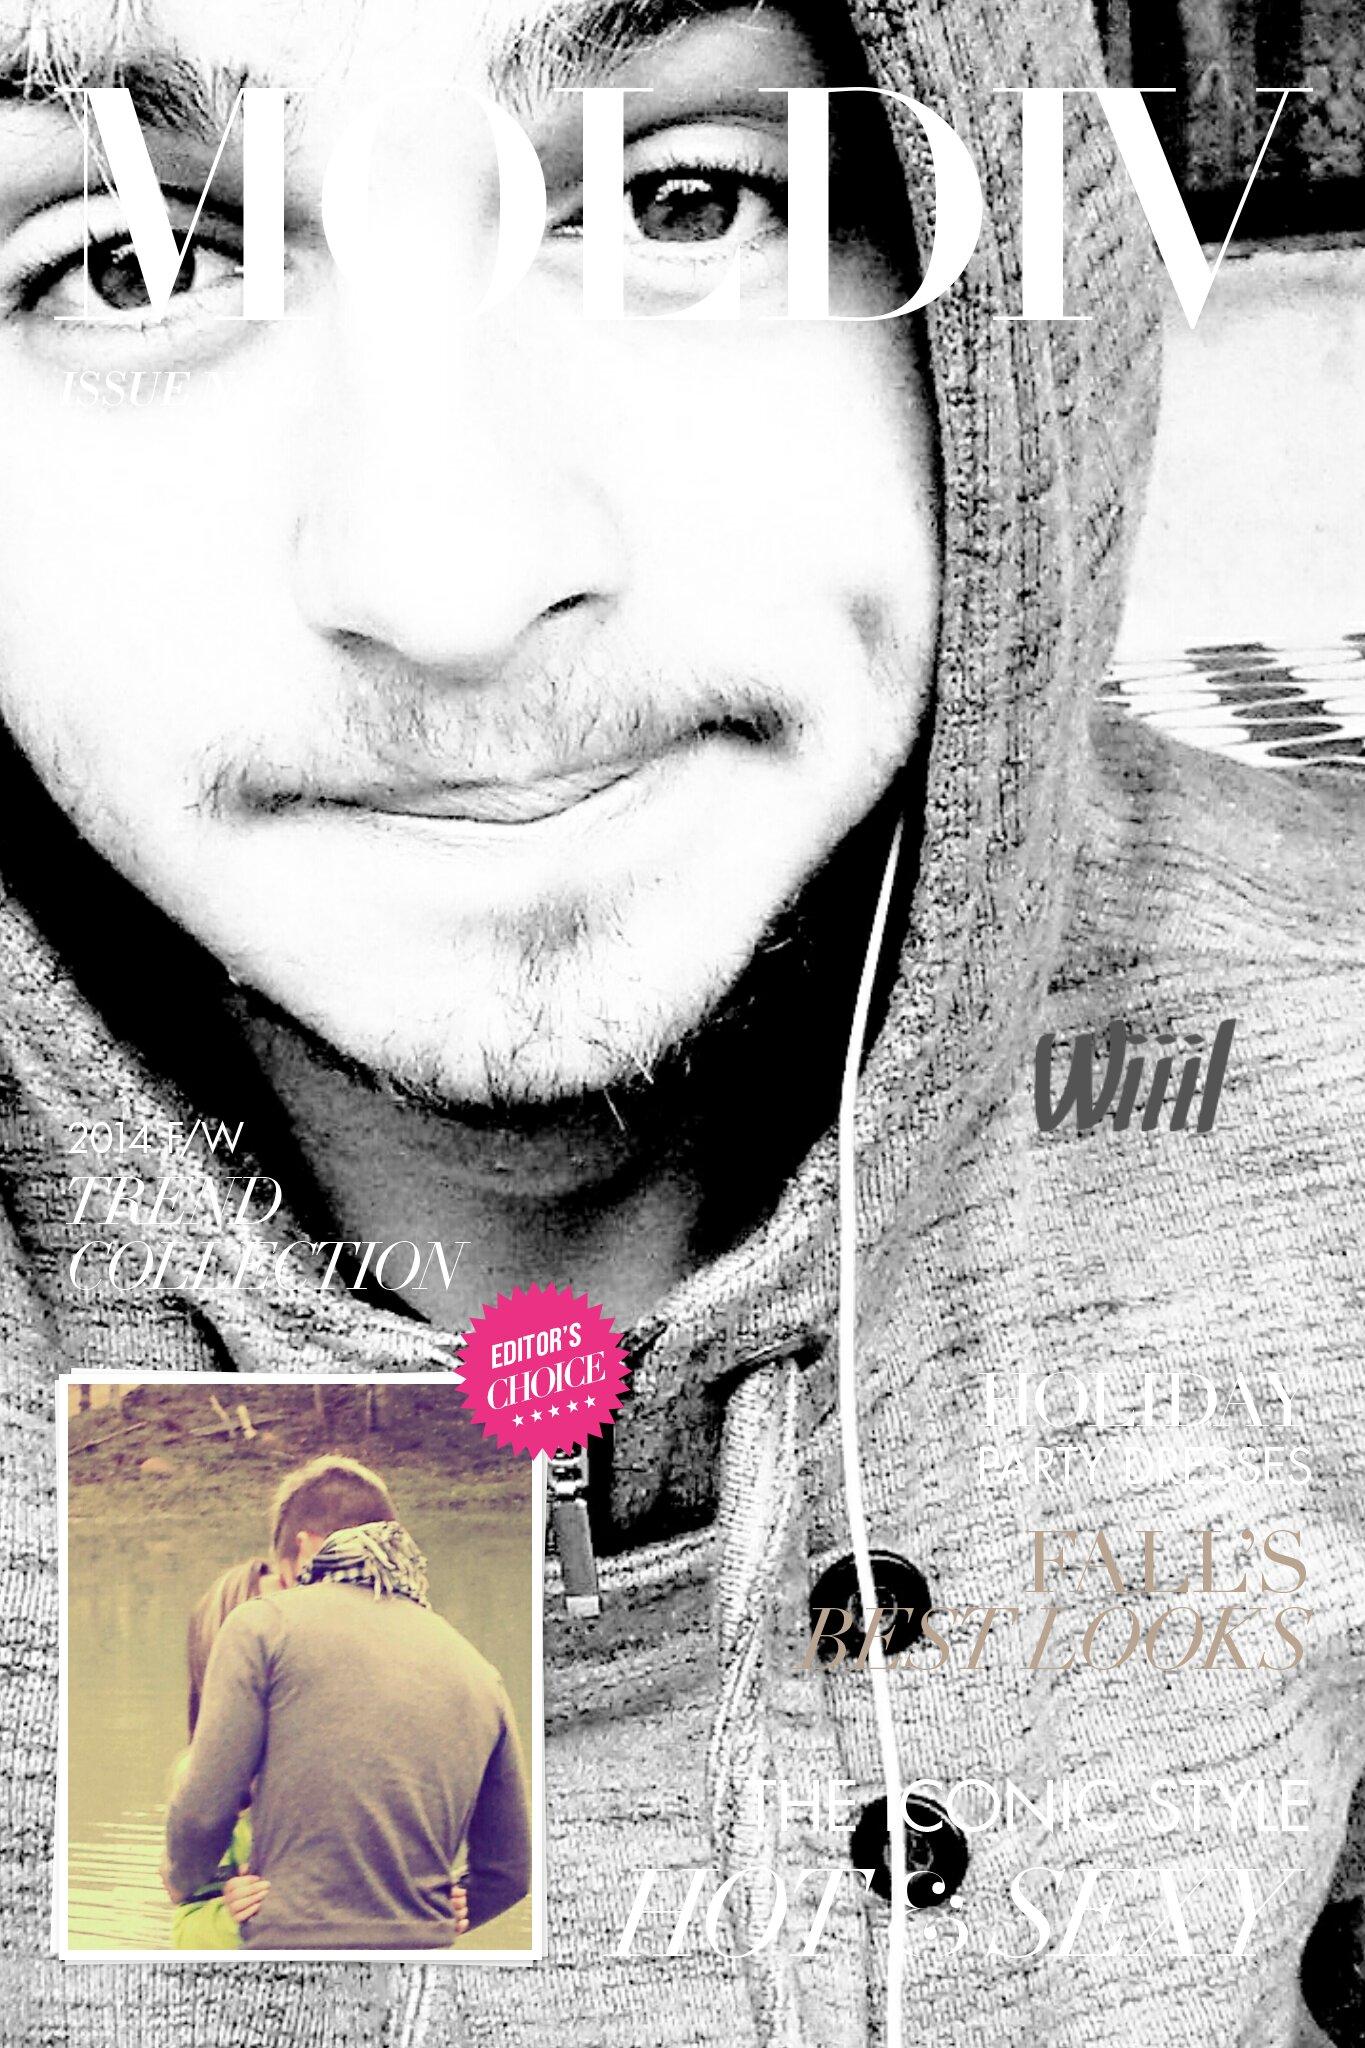 My Photos - Magazine cover